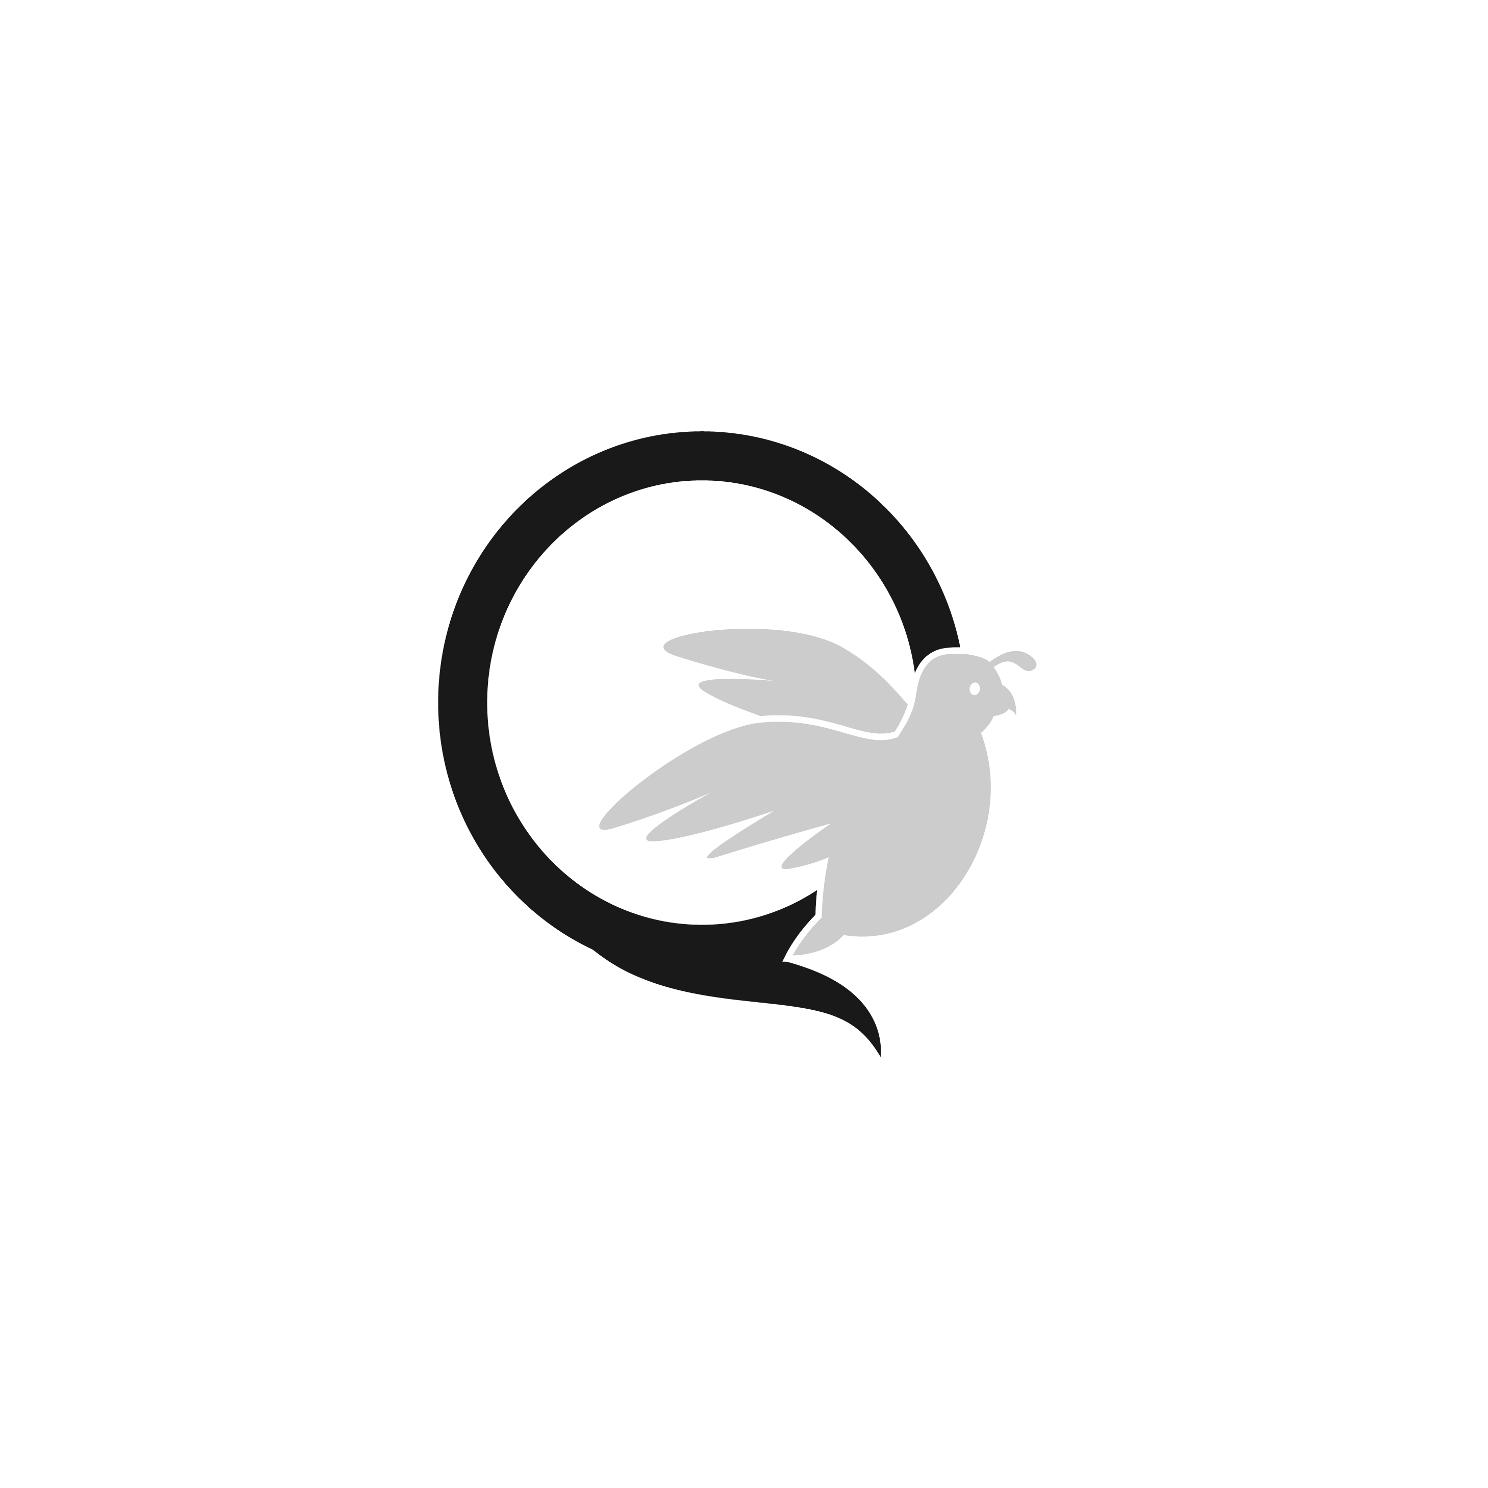 Serious professional logo design for daniel dbrosnihan logo design by sutrisnorasyid for quail ridge country club is looking to create a biocorpaavc